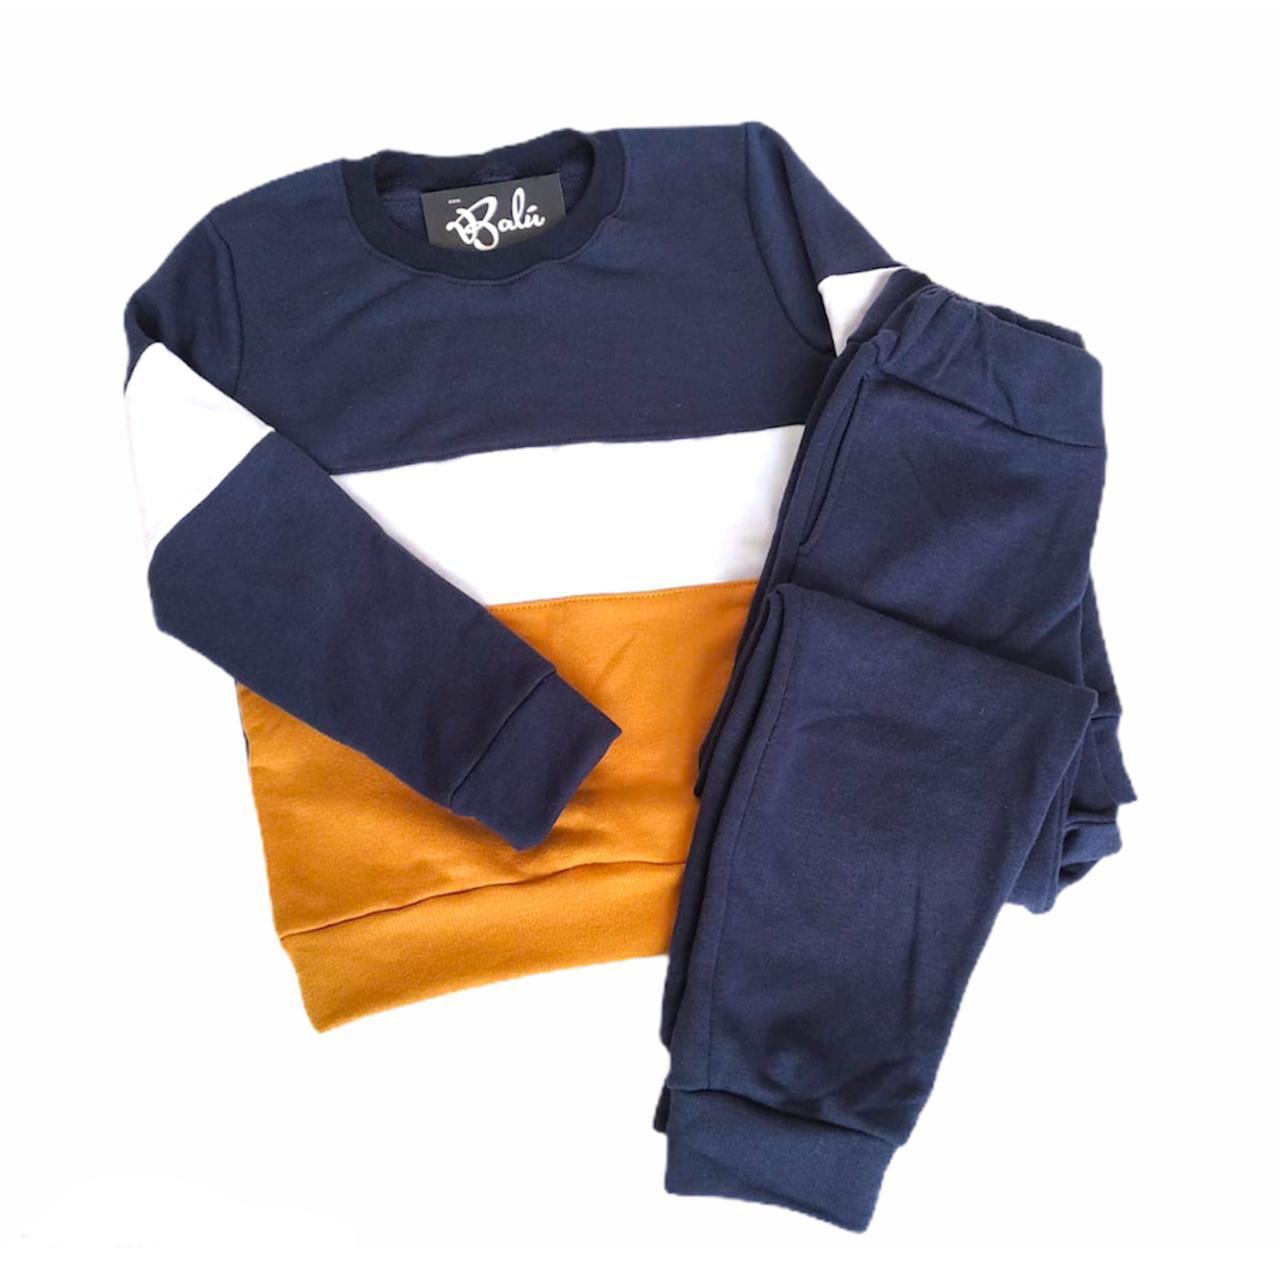 Sudadera para niño azul/mostaza